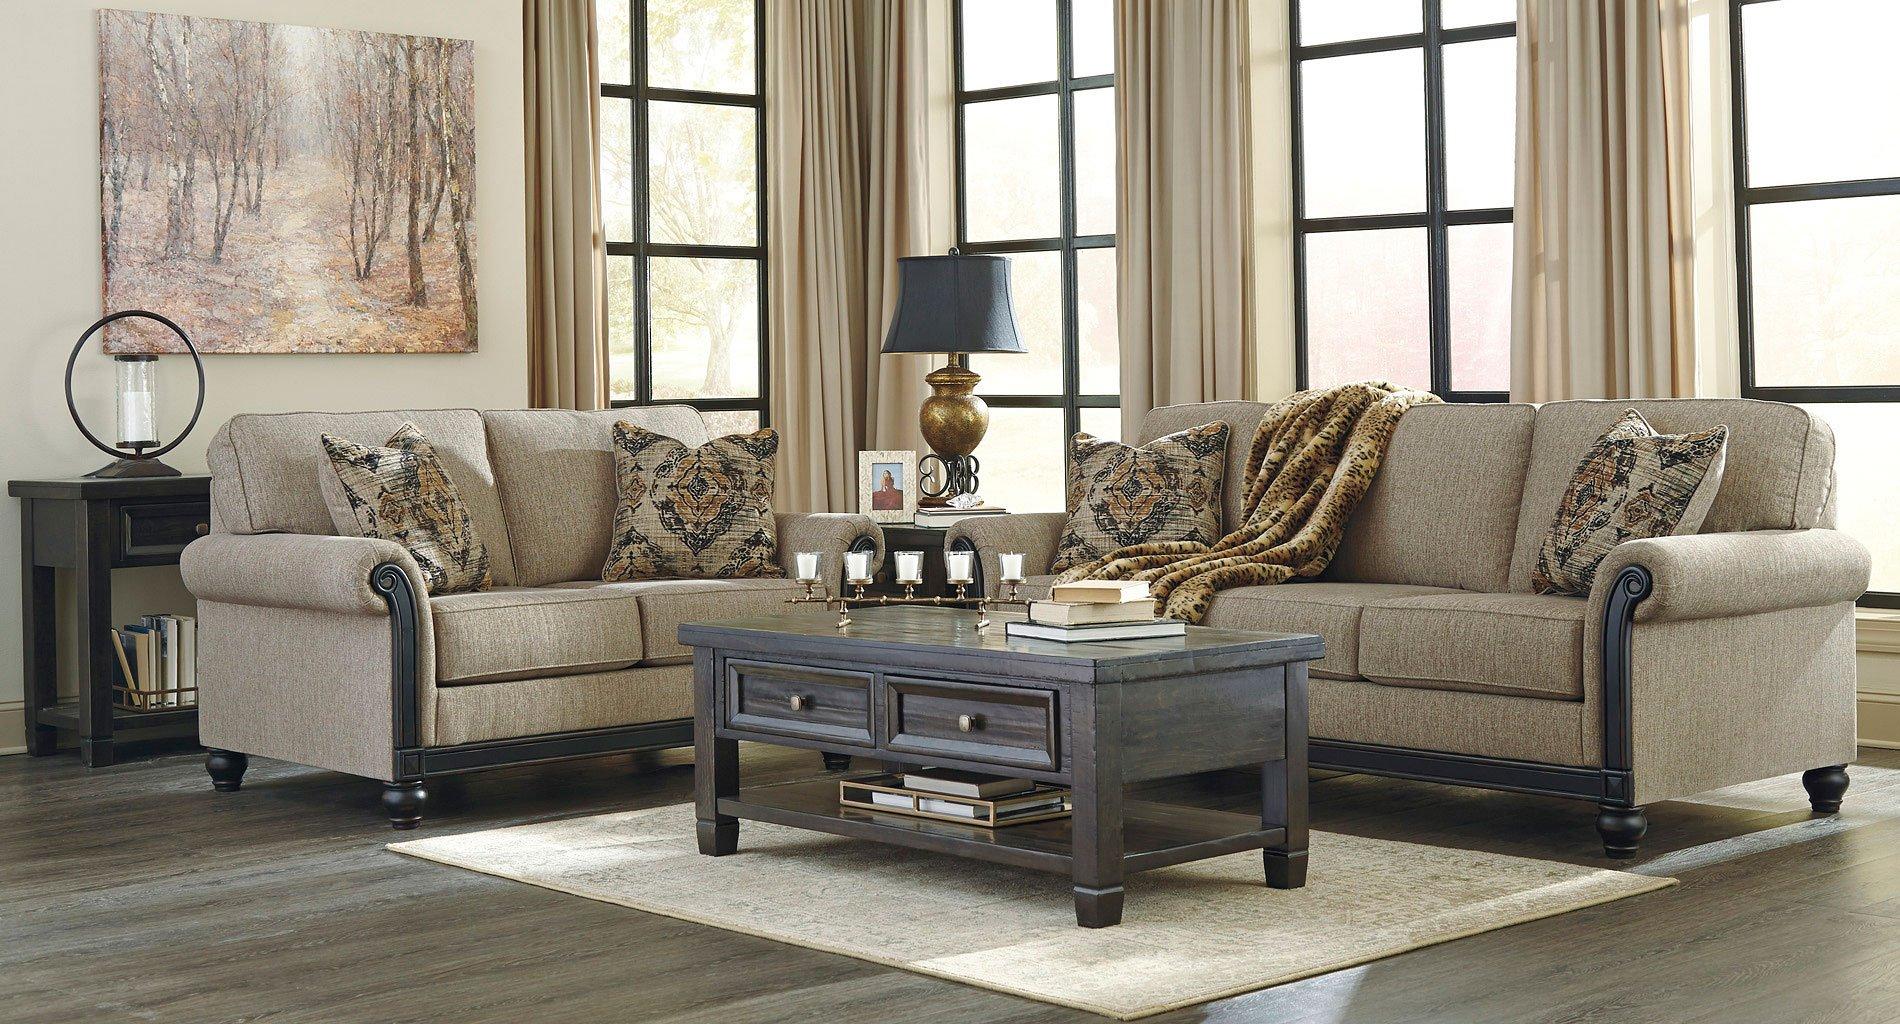 Blackwood Taupe Living Room Set Signature Design, 1 ...